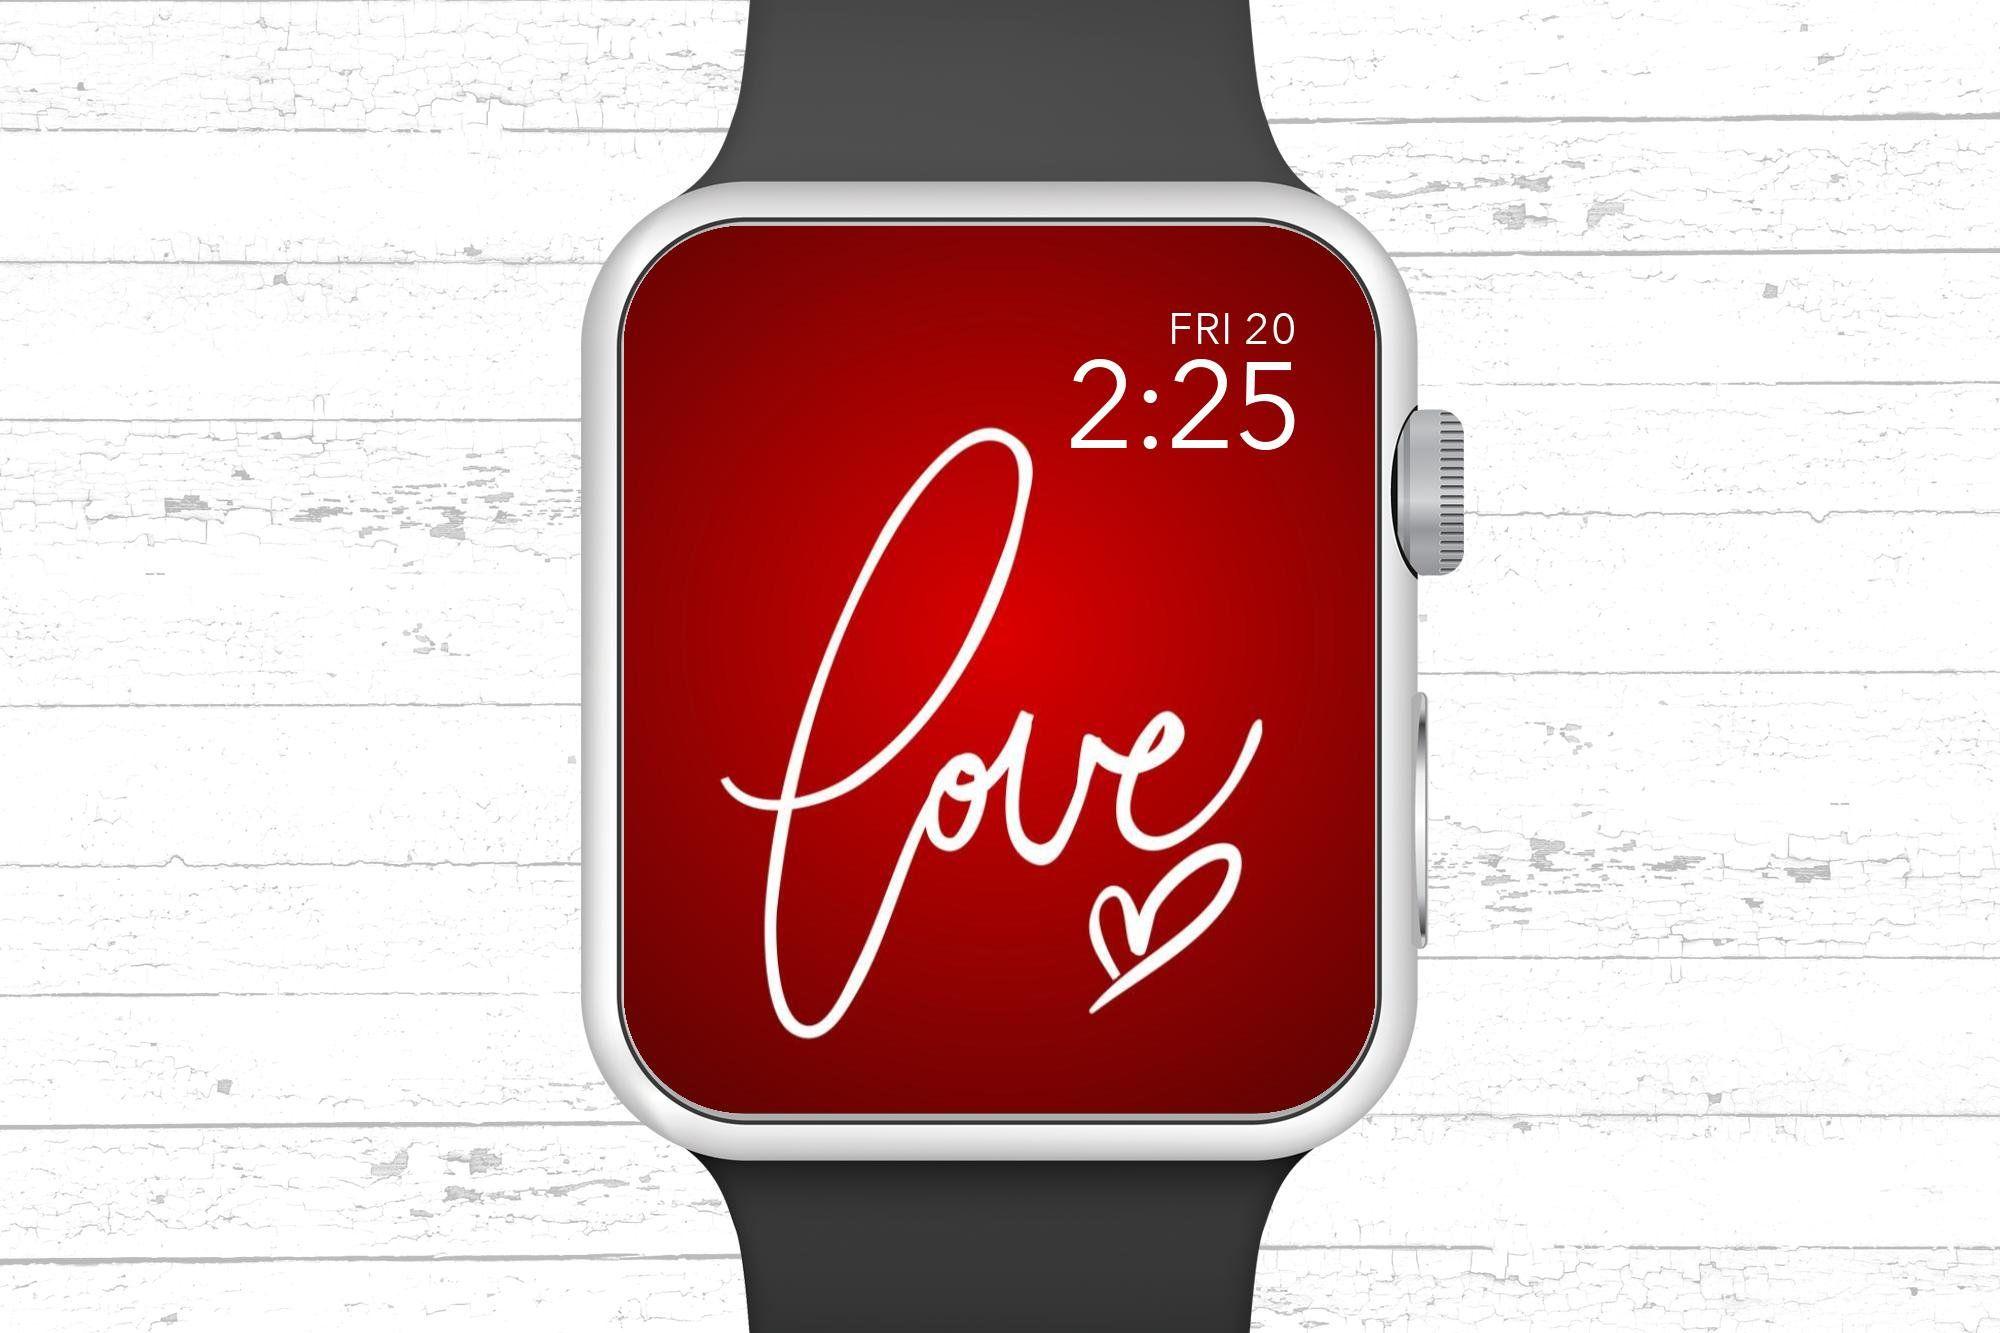 Apple Watch Wallpaper Hand Written Love with Heart Valentines Day 2000x1333